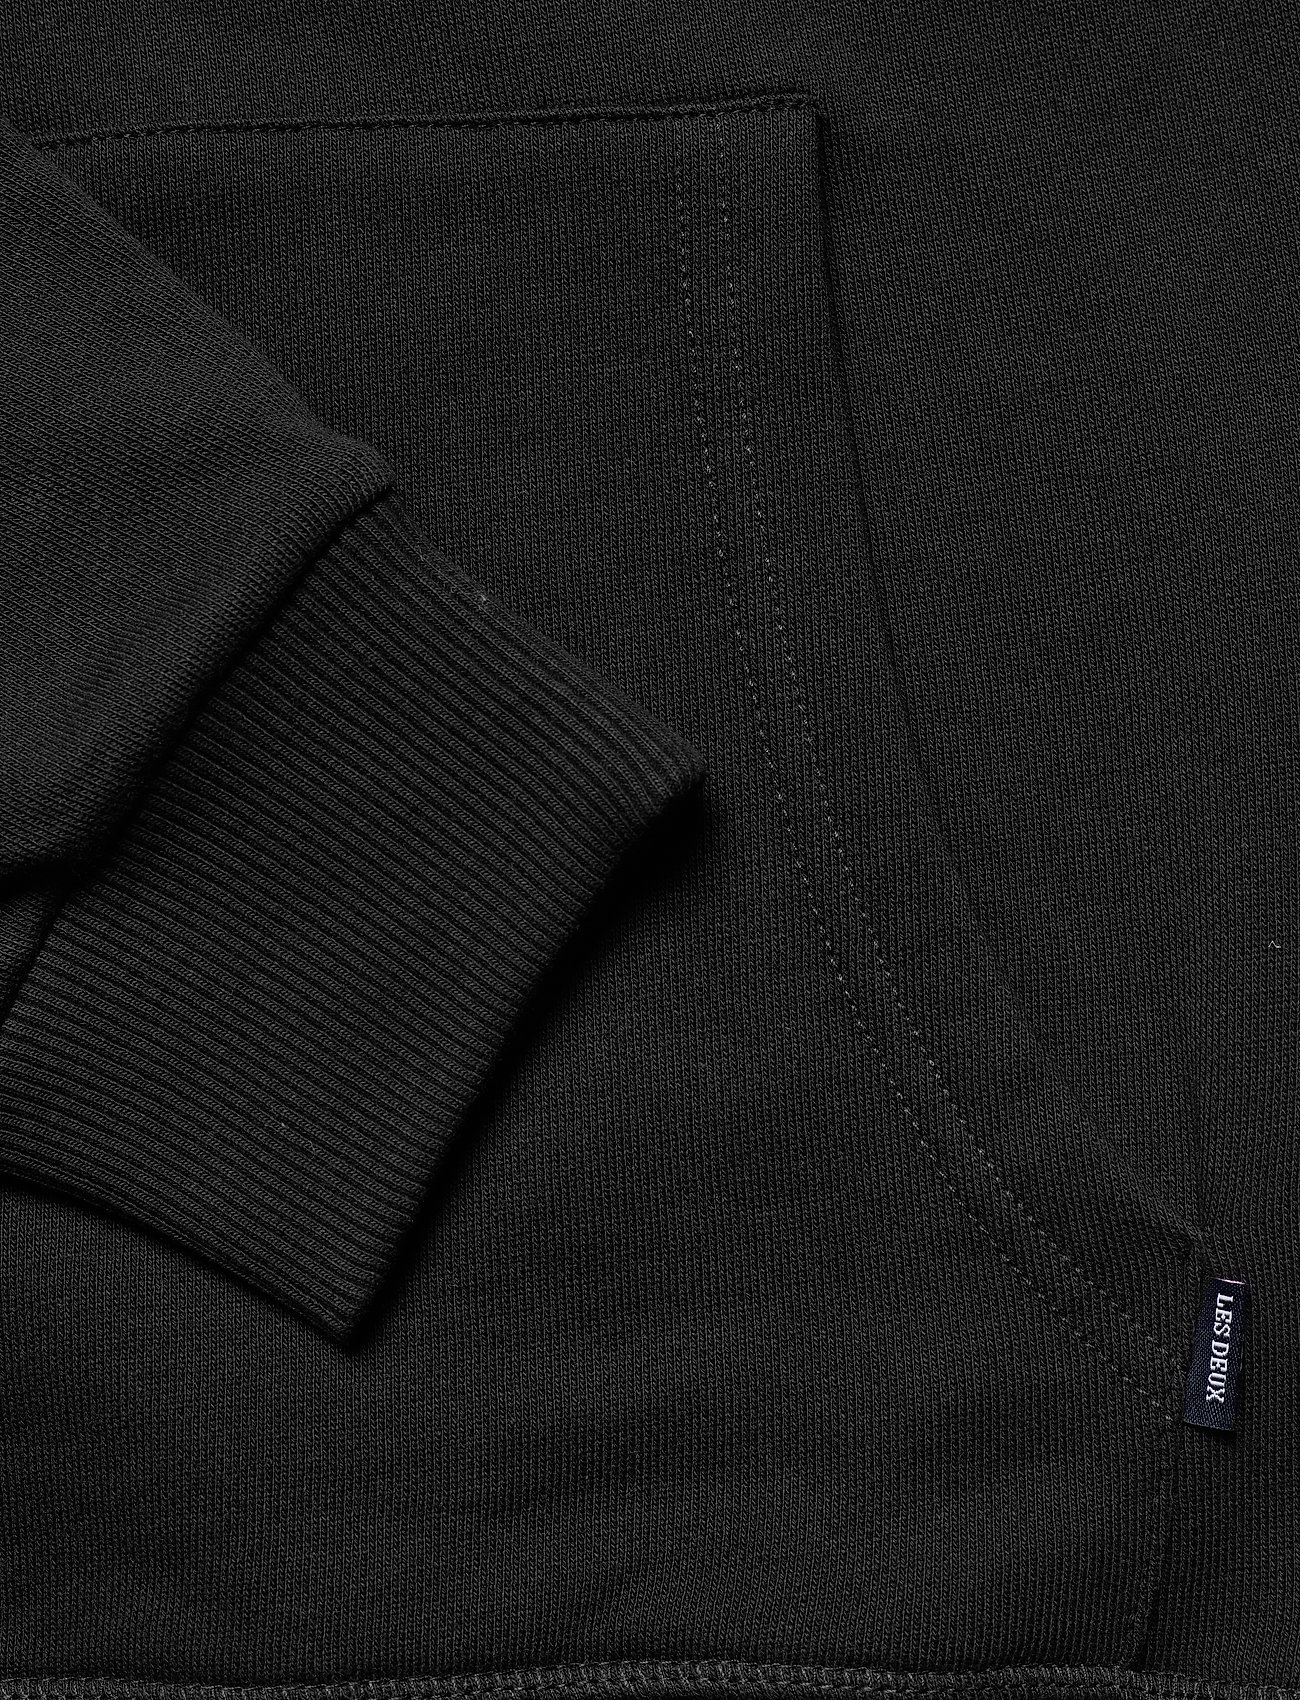 Les Deux Shield Hoodie - Sweatshirts BLACK - Menn Klær